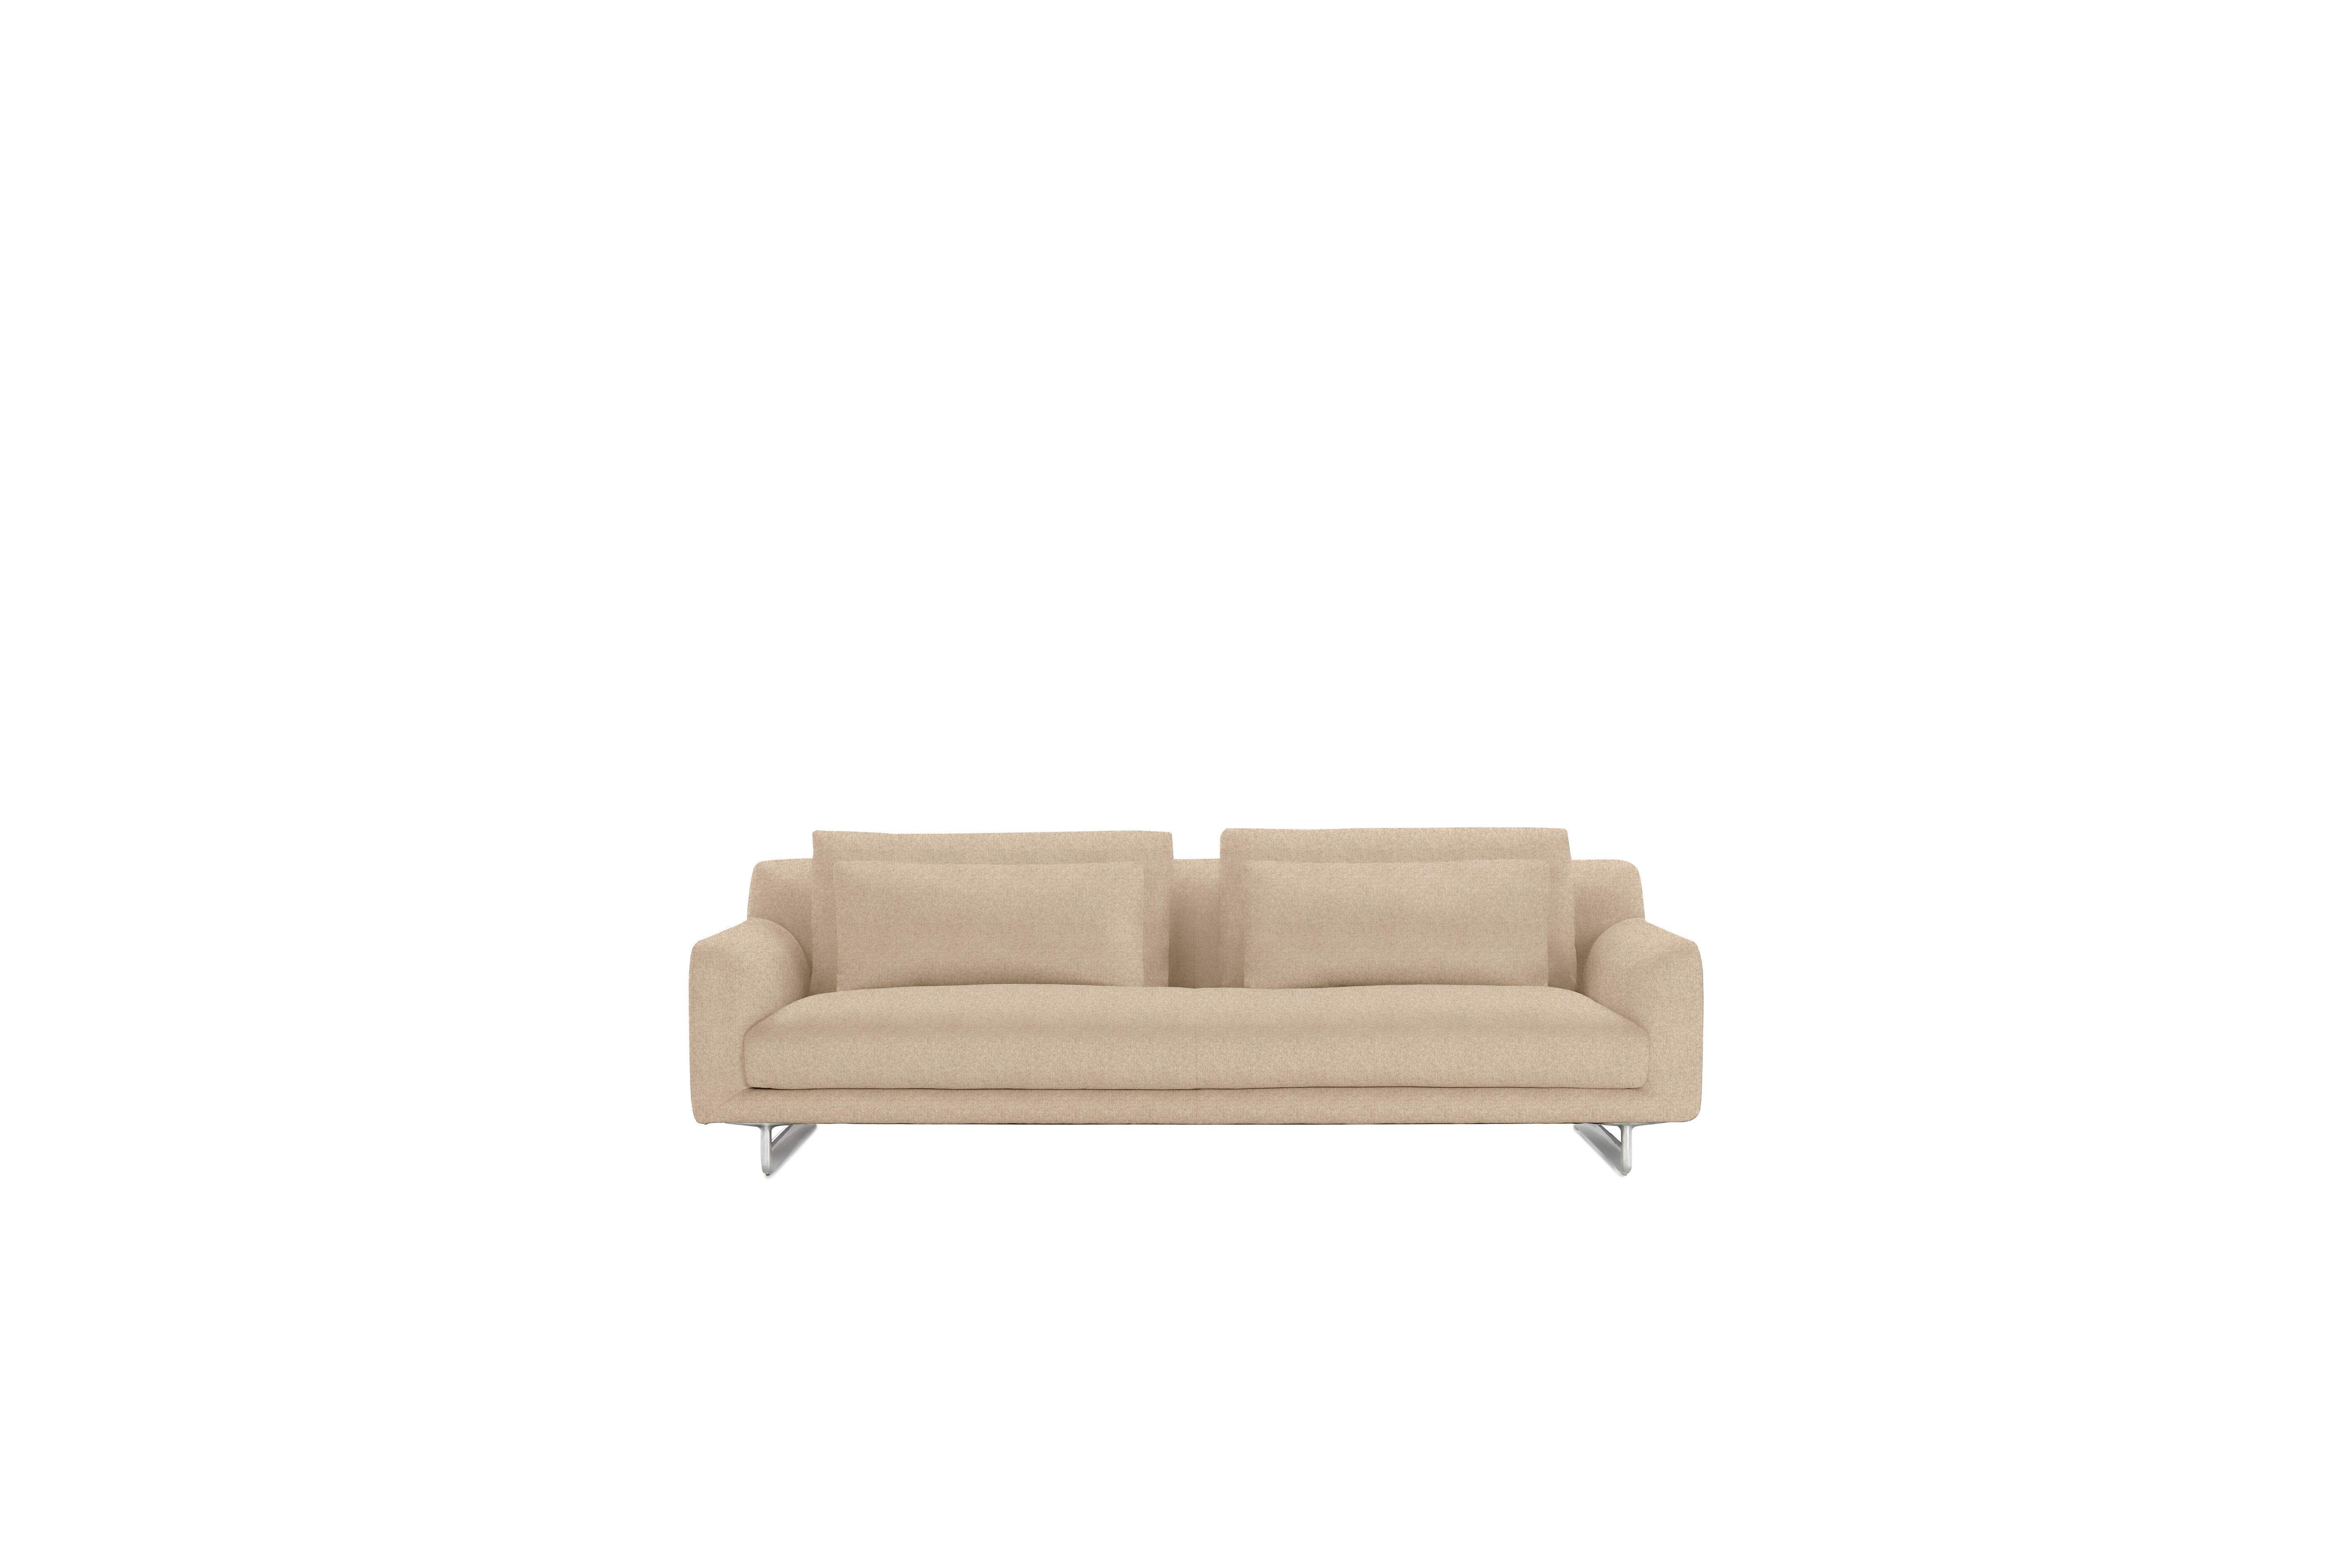 "Lecco Sofa, Tan, 93"" by Design Within Reach"